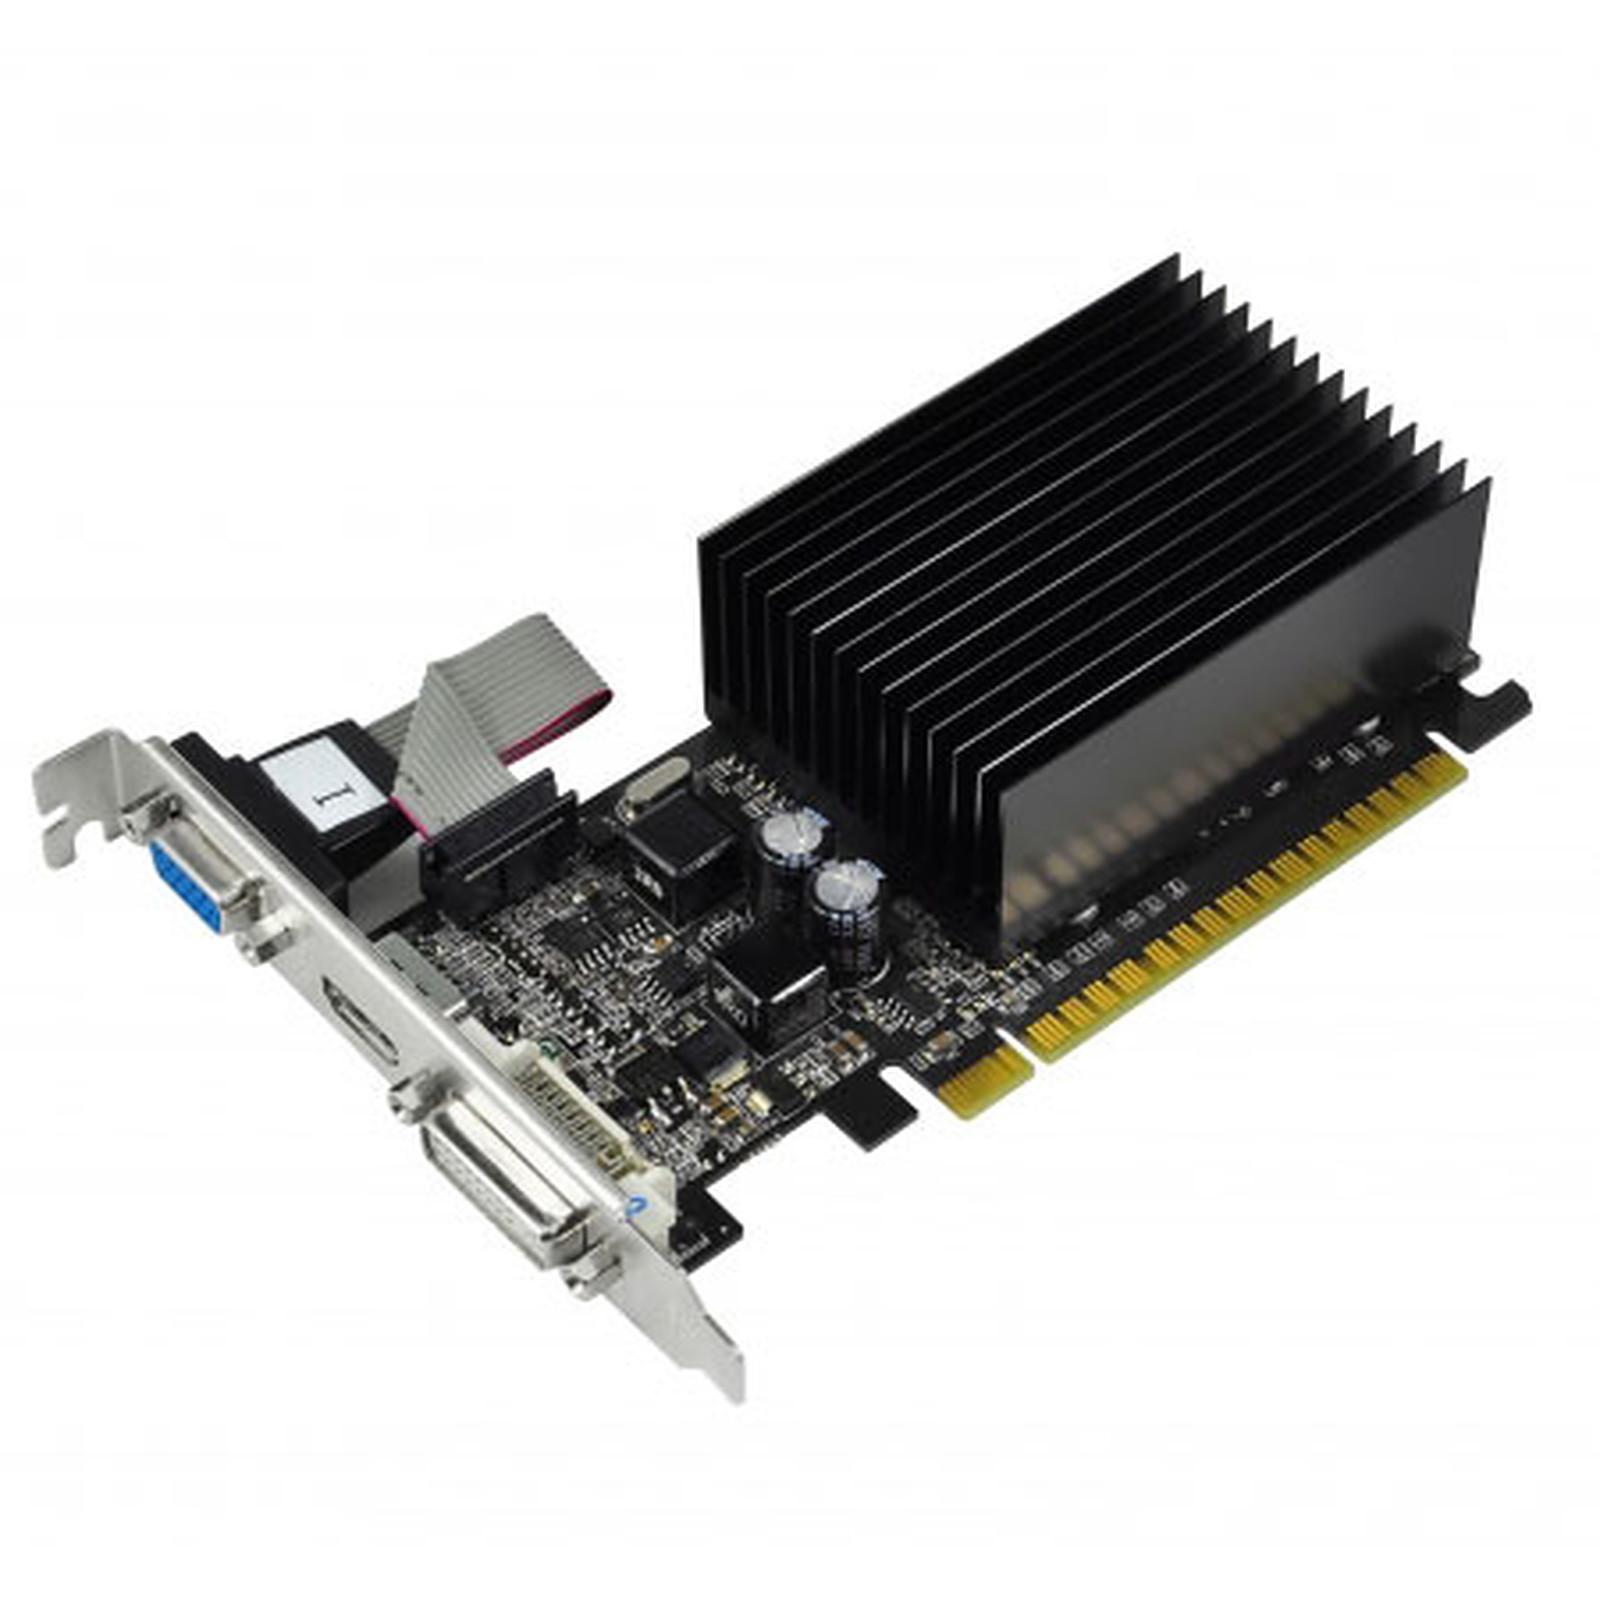 NVIDIA GeForce 210 512 MB Passive